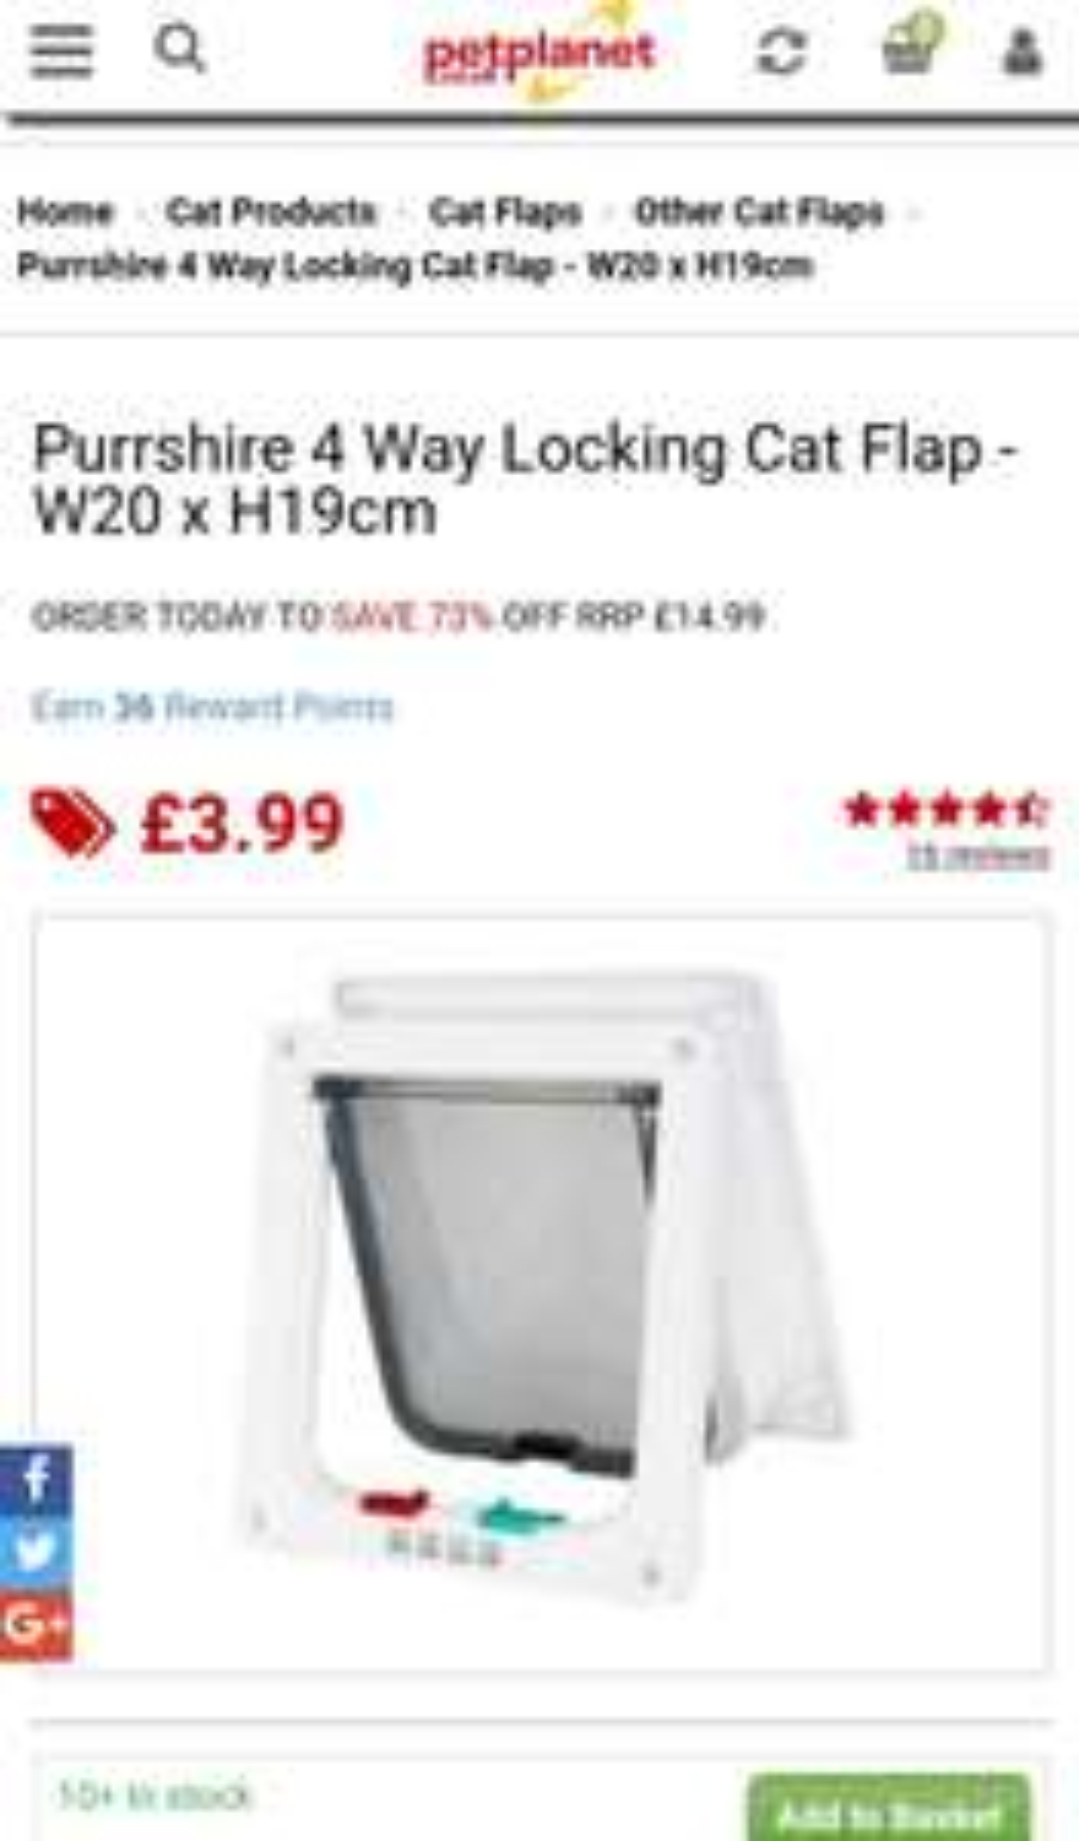 4 Way Cat flap £3.99 / £8.98 delivered @ Pet planet